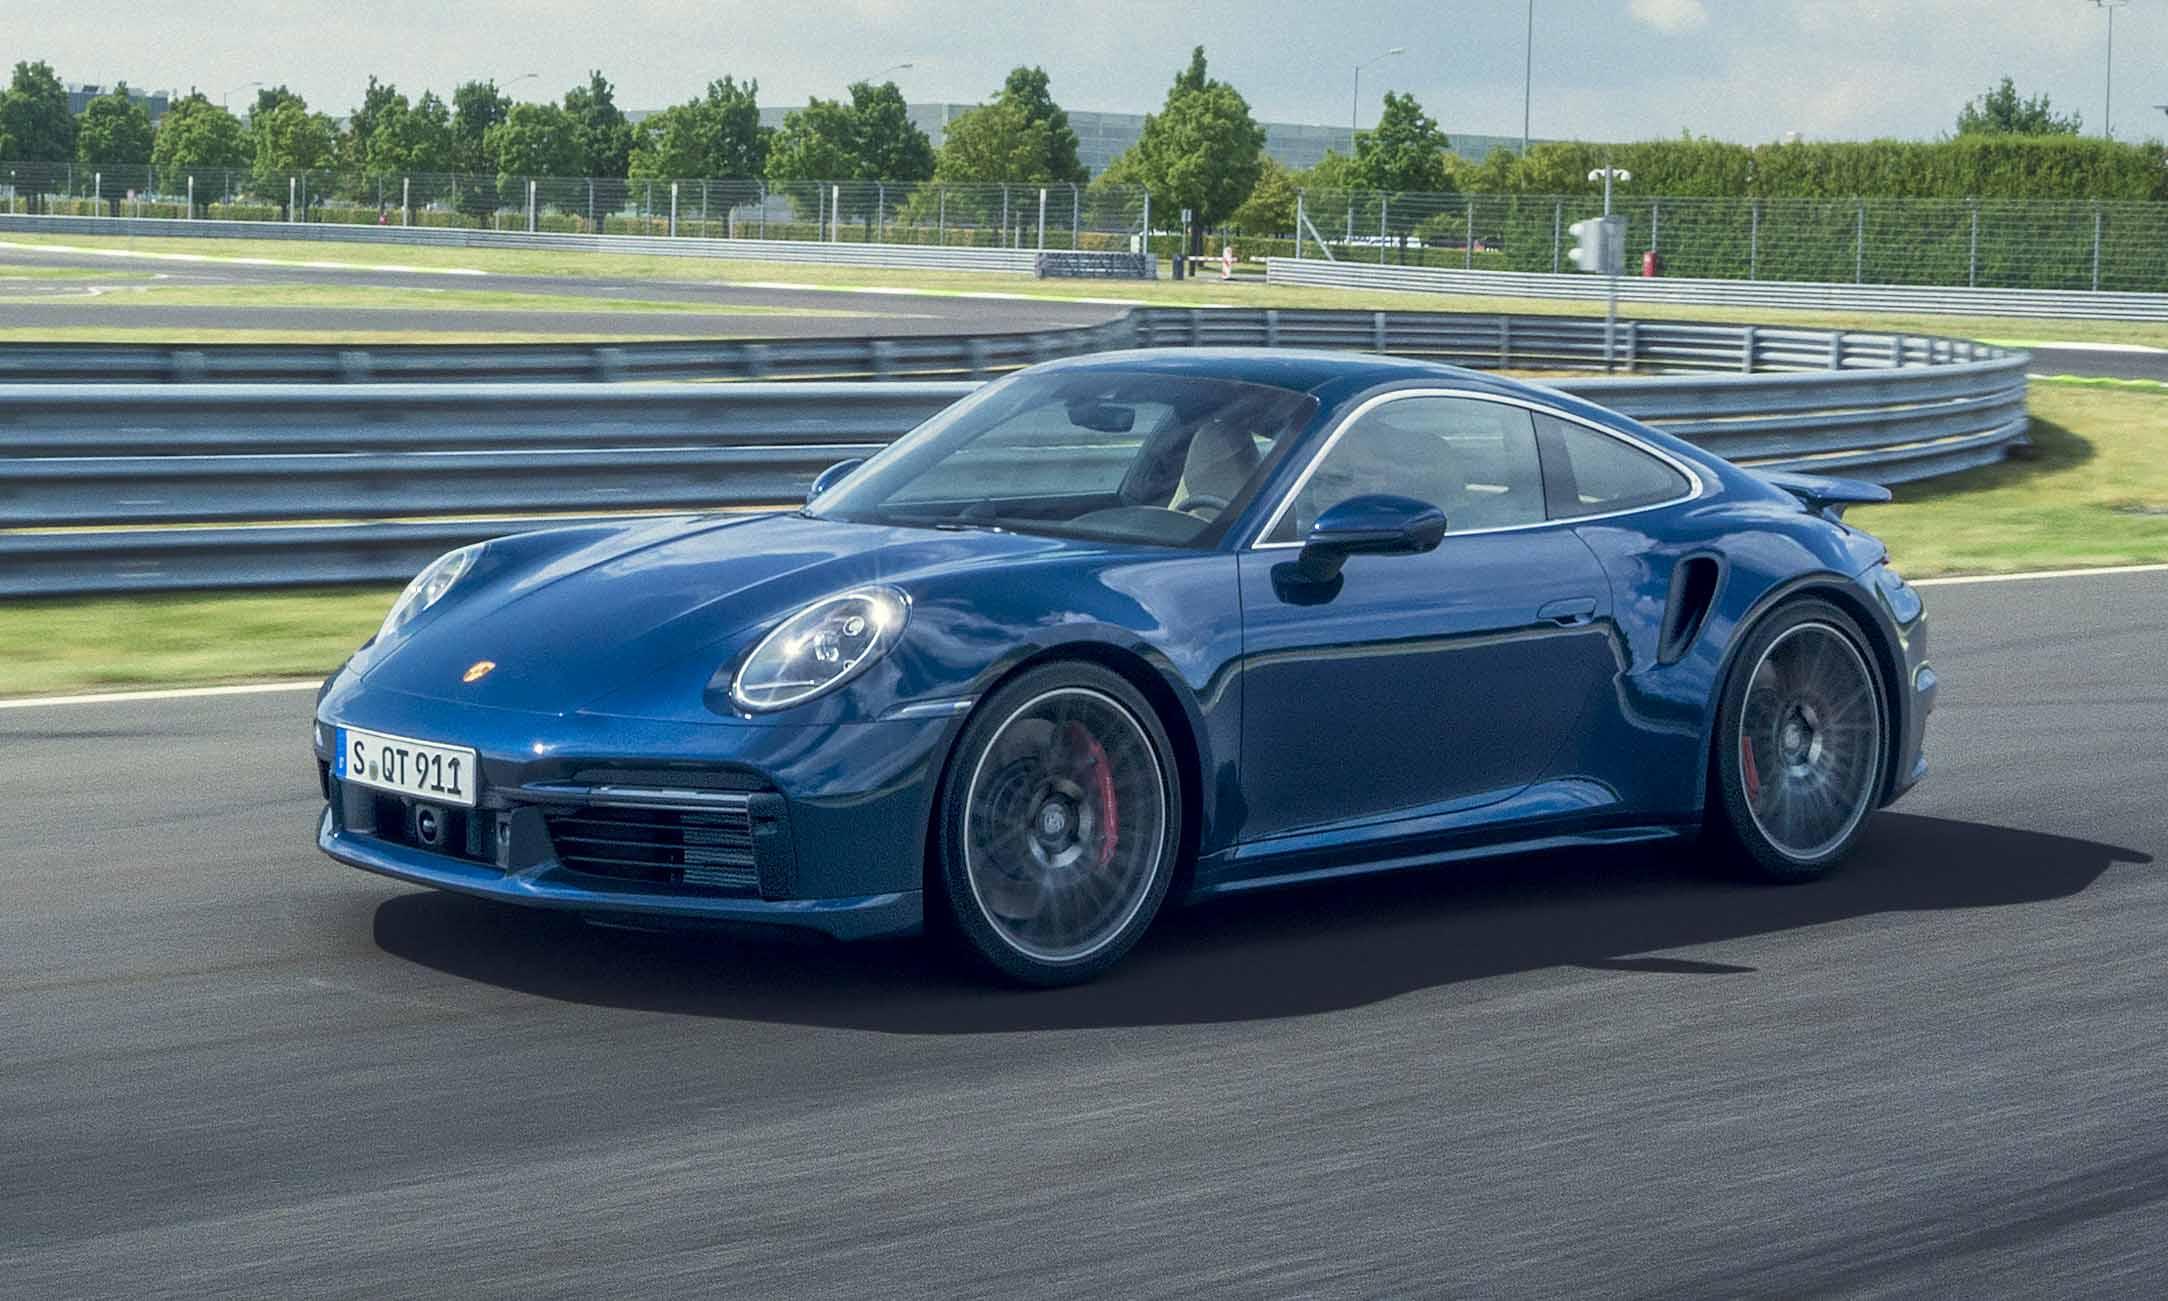 2021 Porsche 911 Turbo First Looknbsp